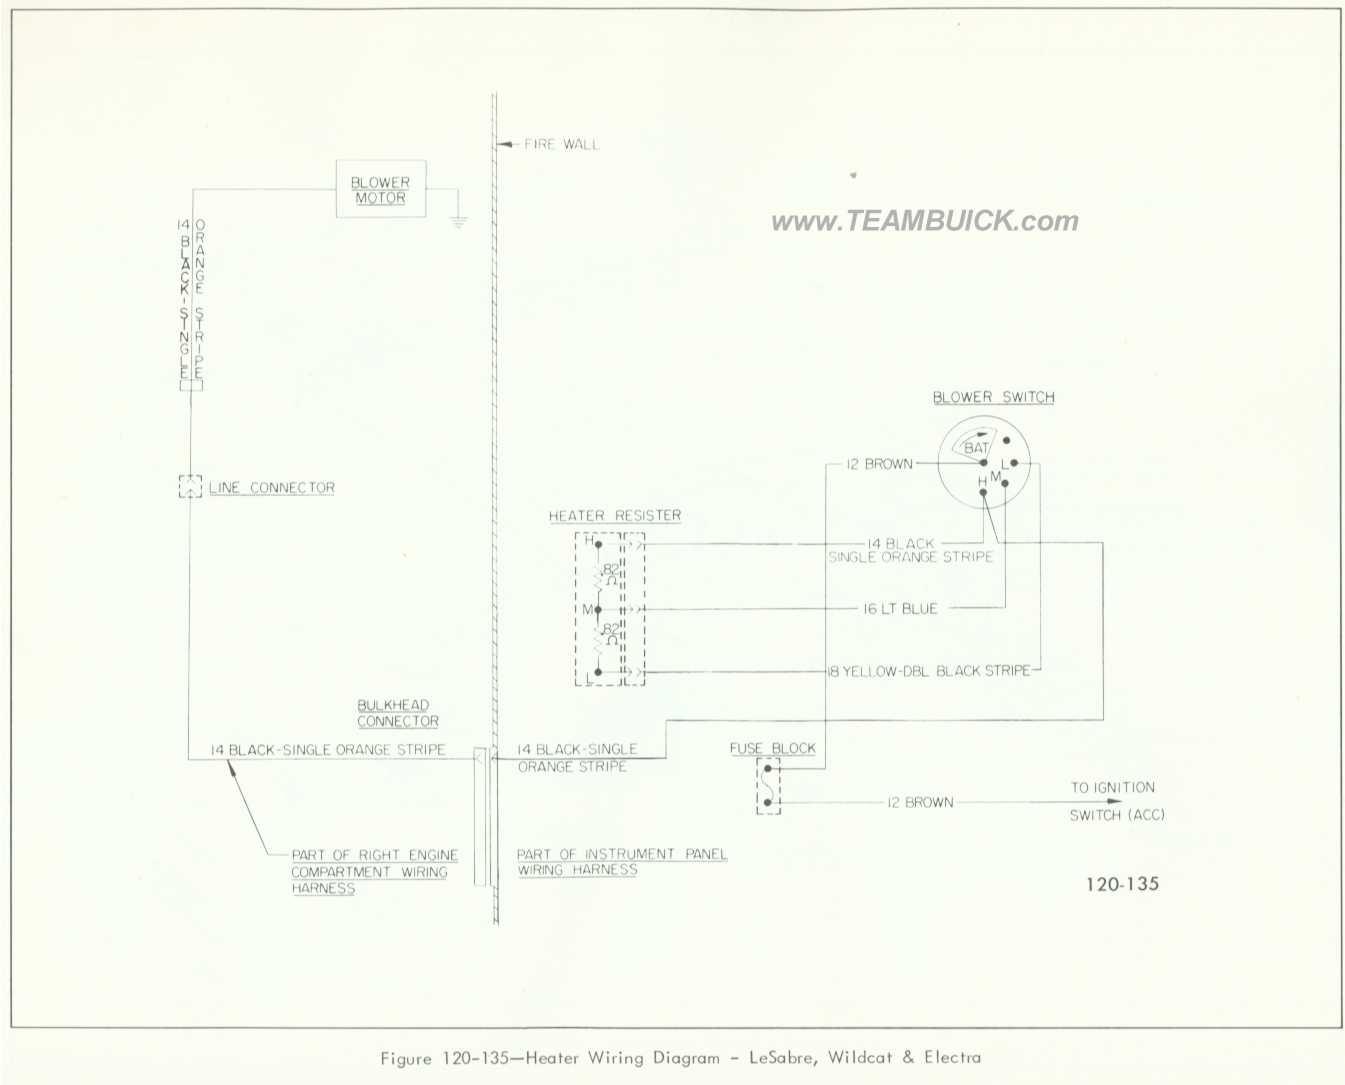 1966 Buick LeSabre, Wildcat, Electra, Heater Wiring Diagram